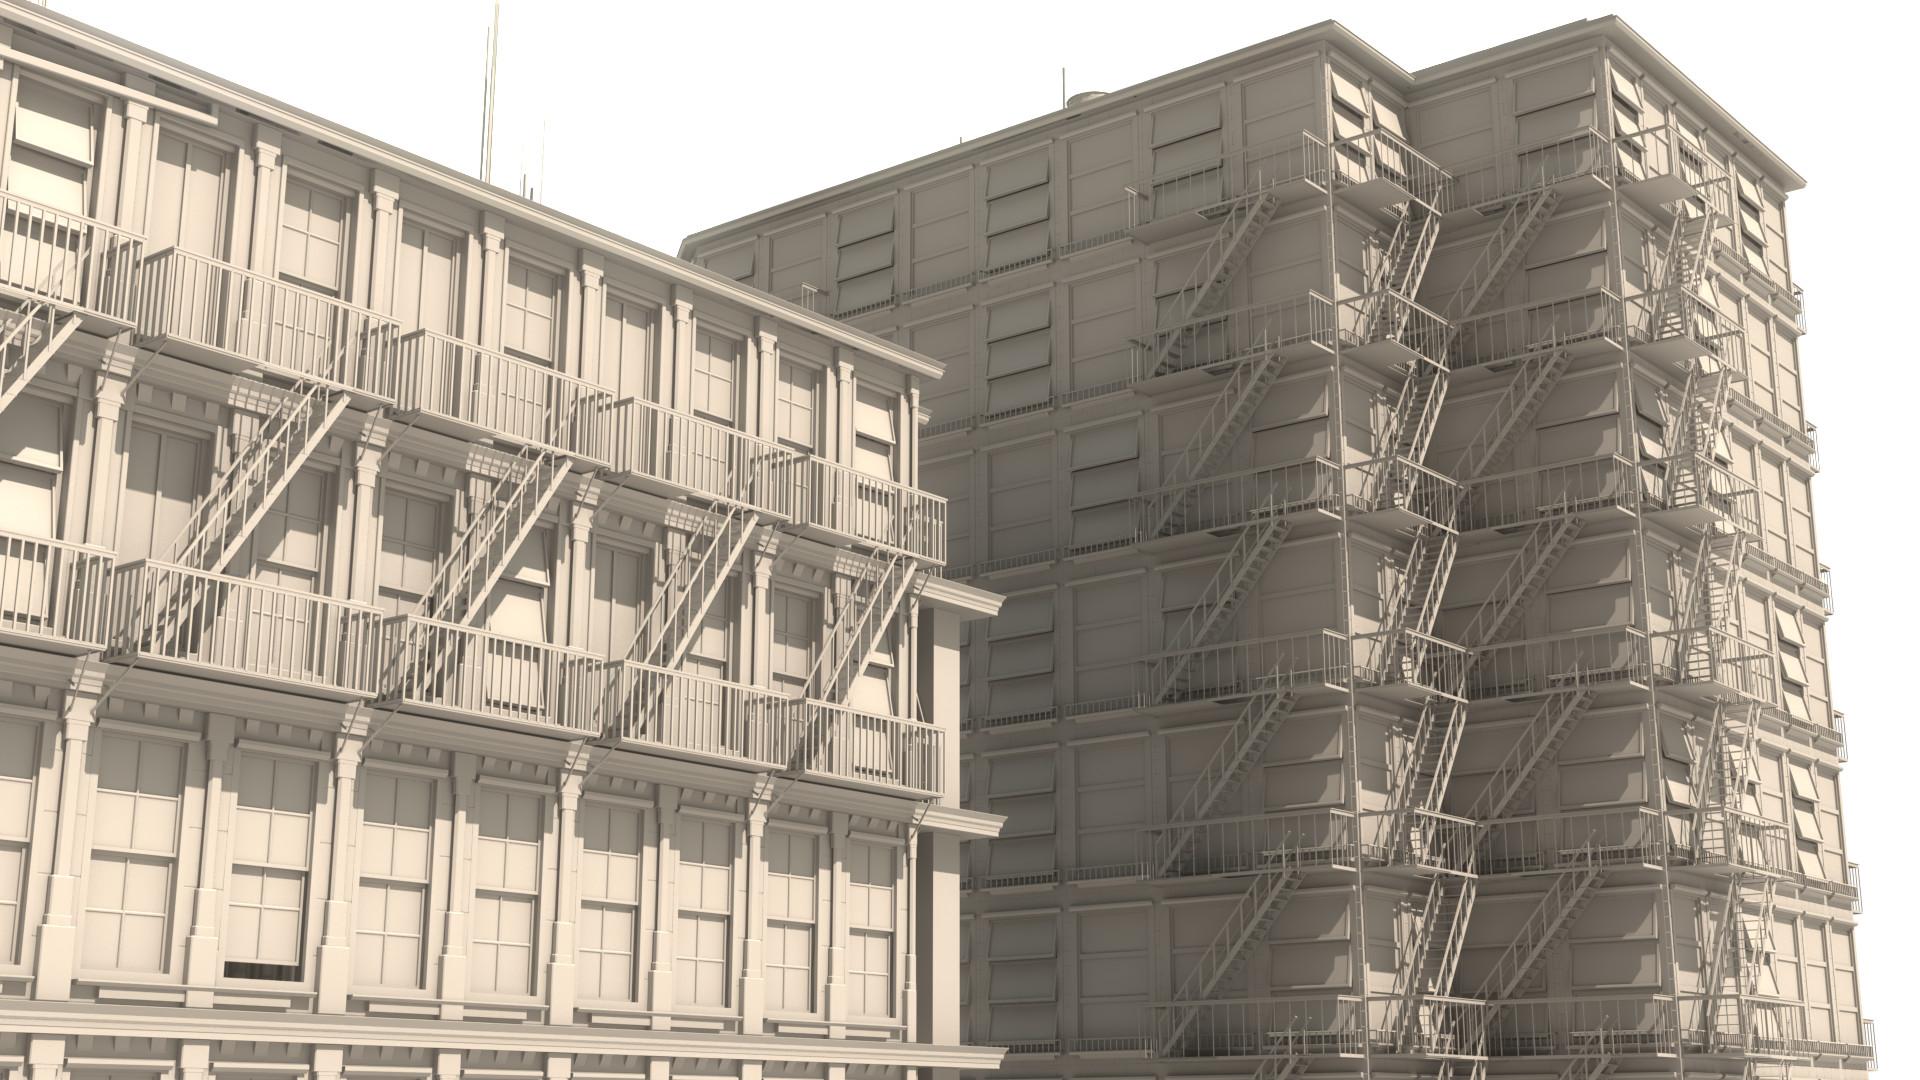 Wayne robson buildingtestd